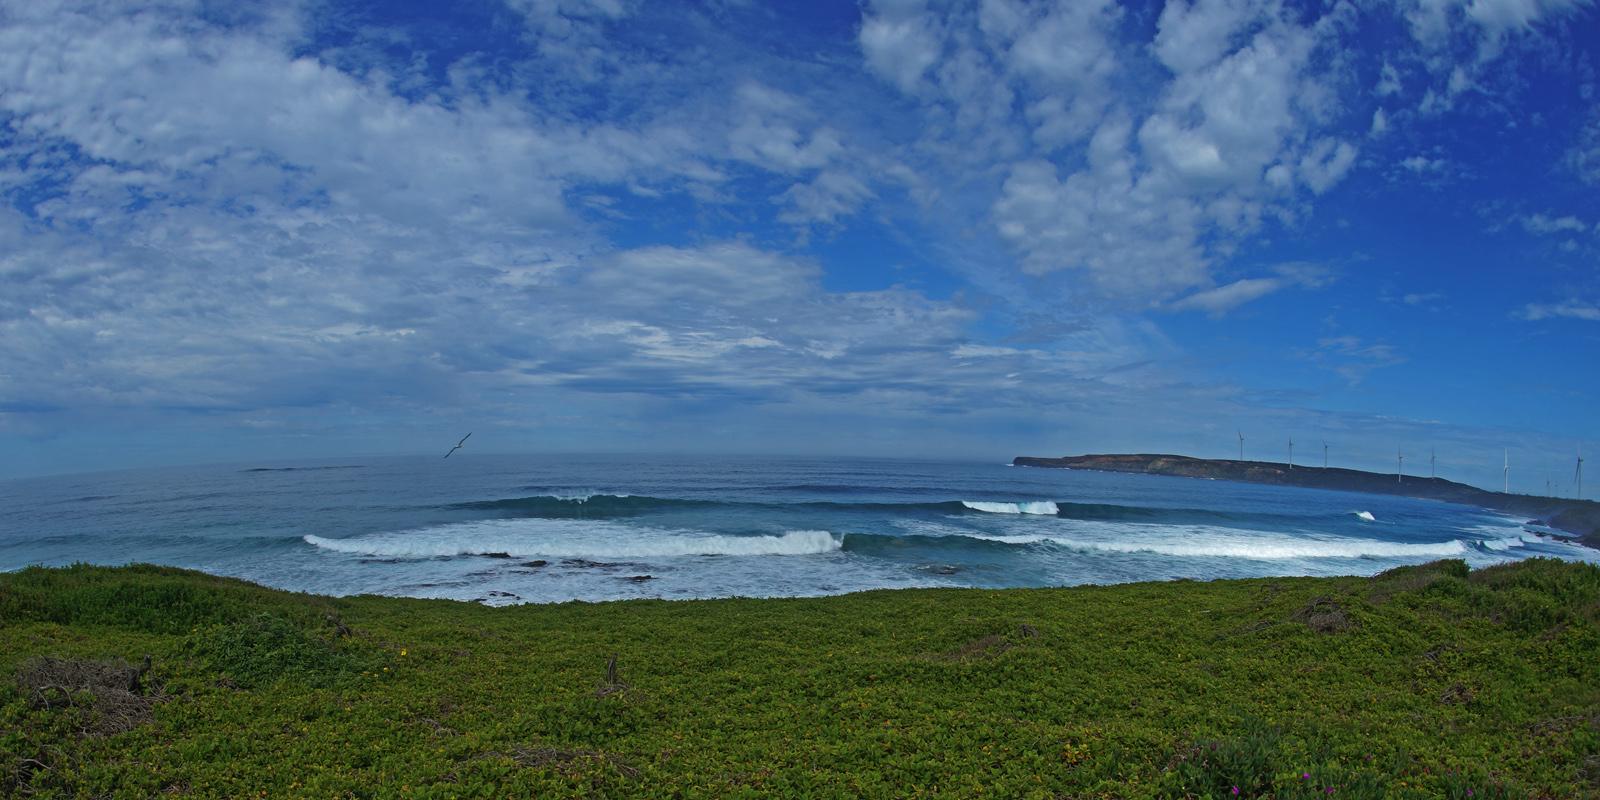 CAPE GRANT - Cape Sir William Grant and Grant Bays volcanic coastline.